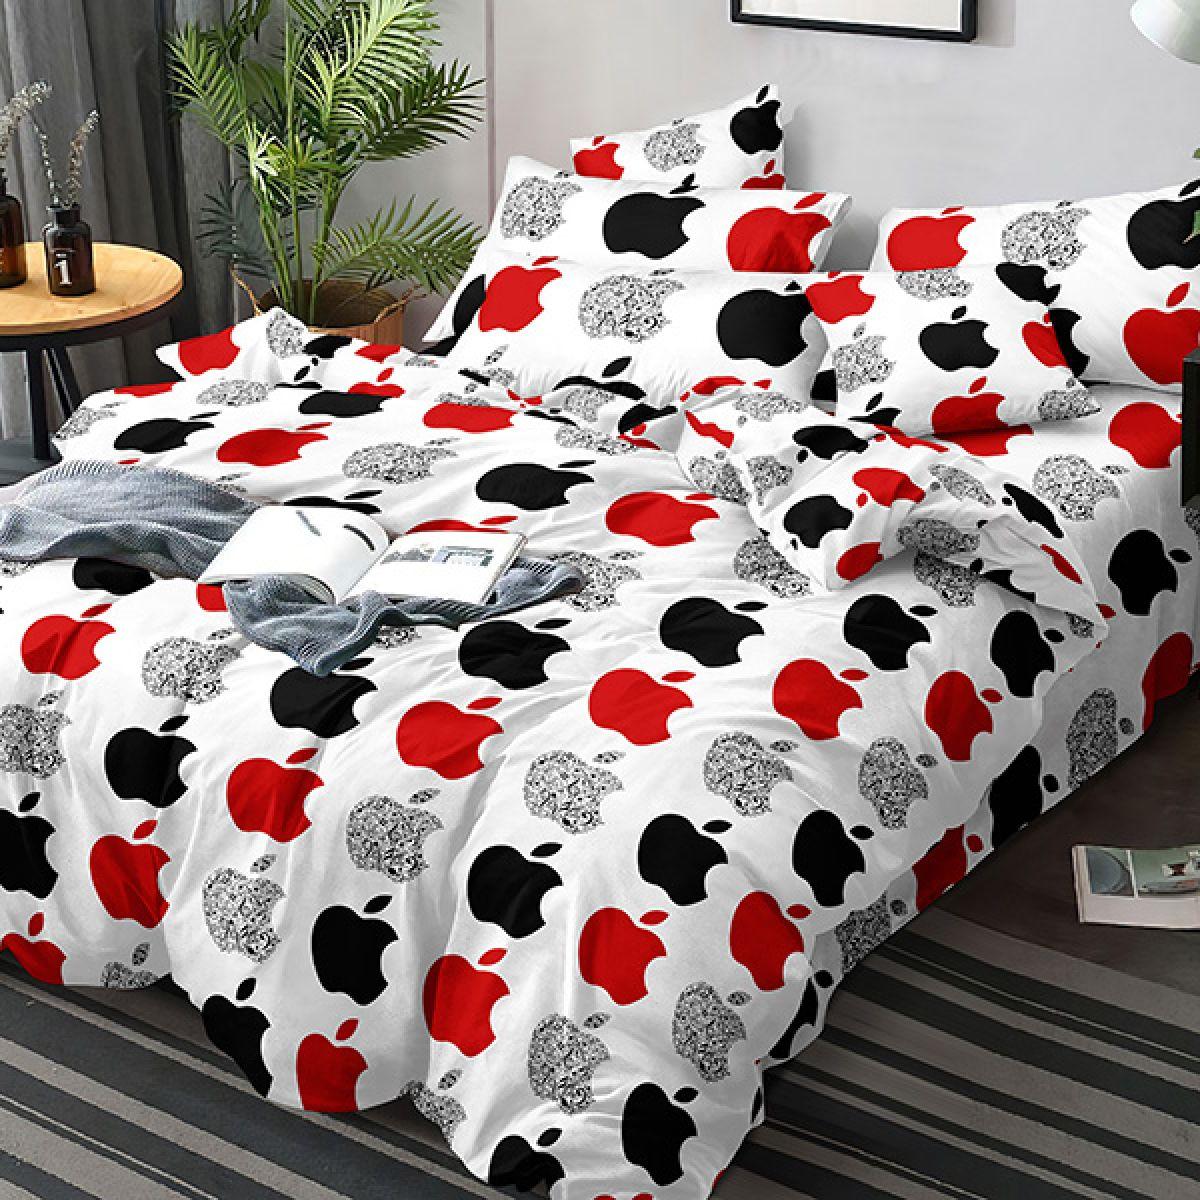 3D Beddings - Antonio - AML-4245 - 140x200 cm - 2 pcs